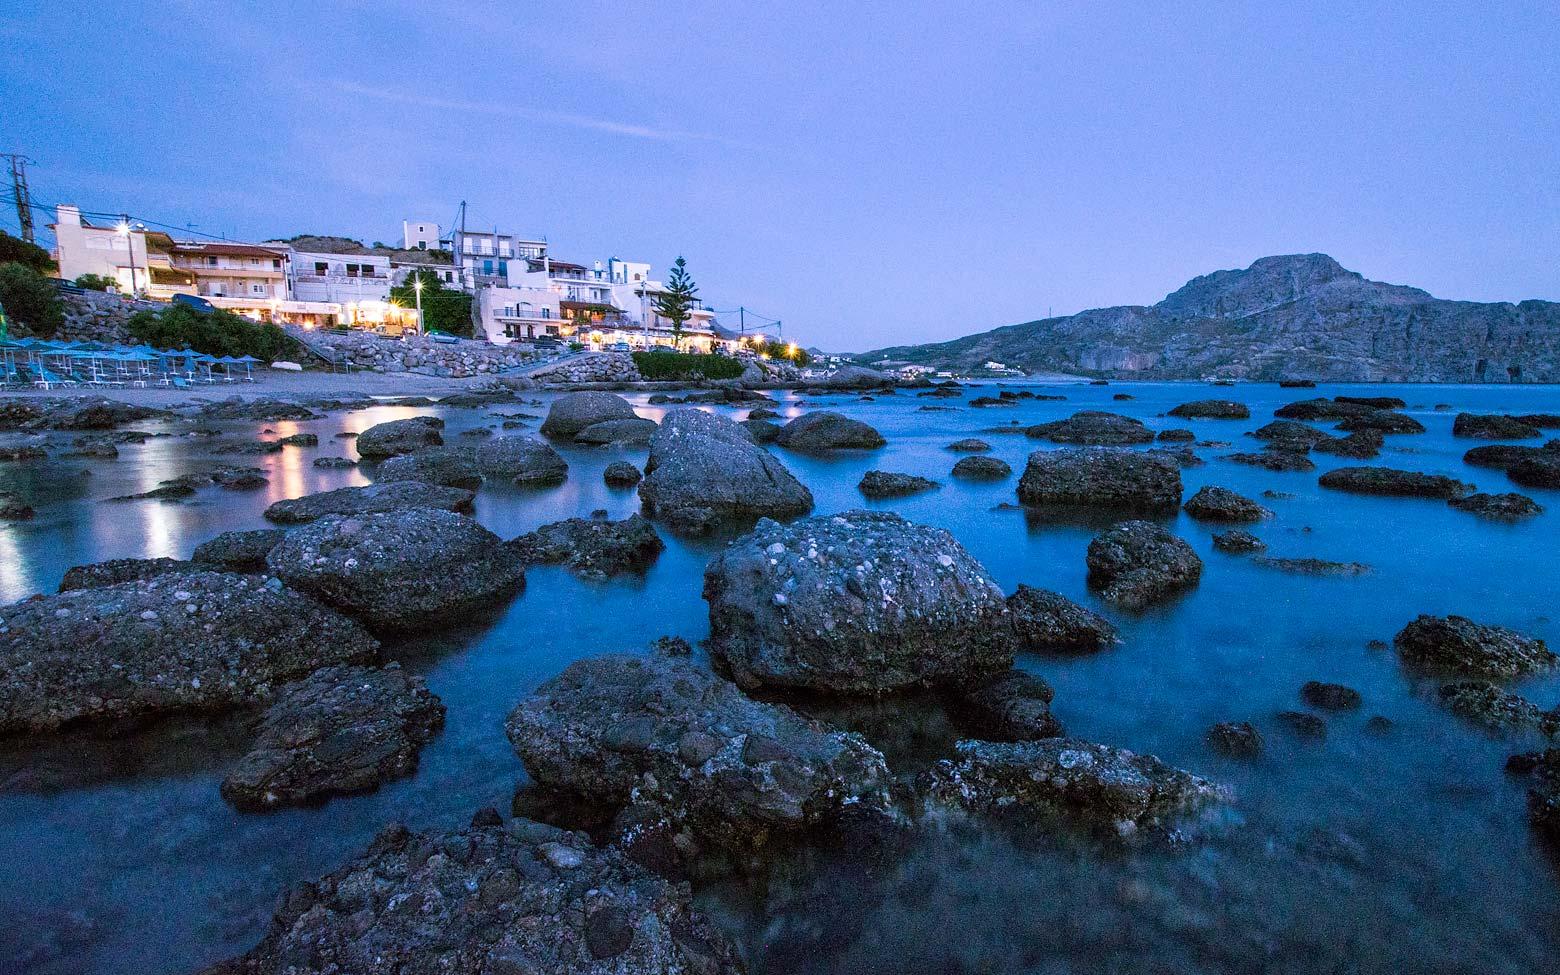 photo crete - the village of Plakias